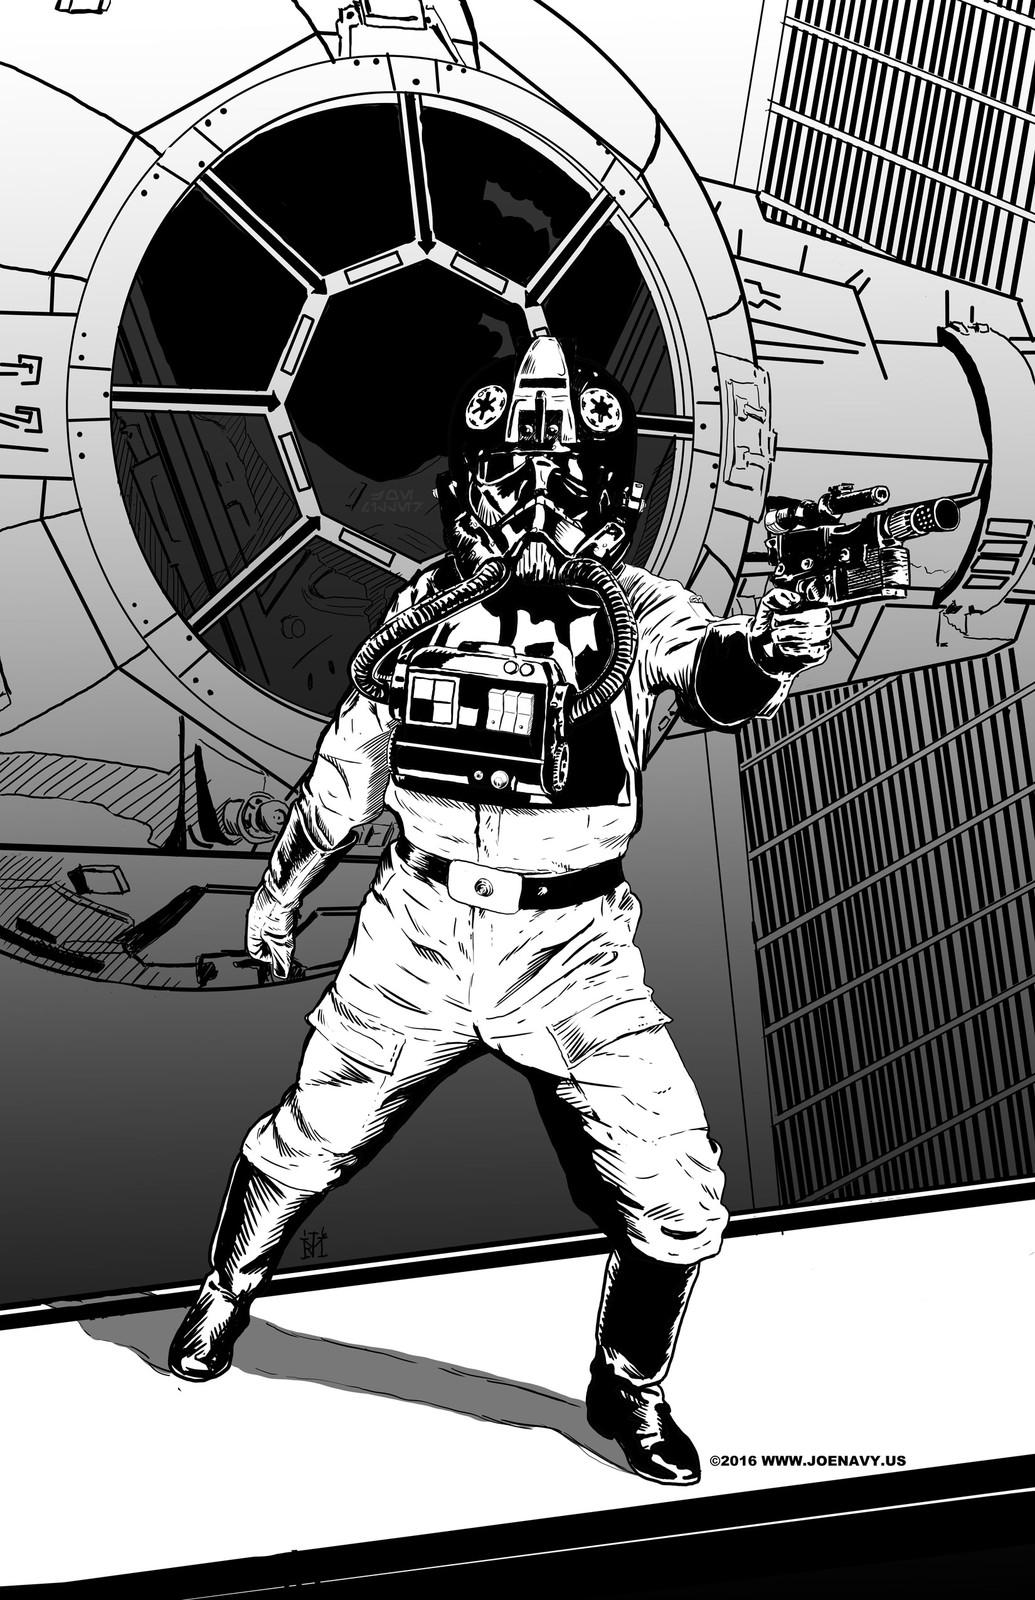 Tie Fighter Pilot Illustration